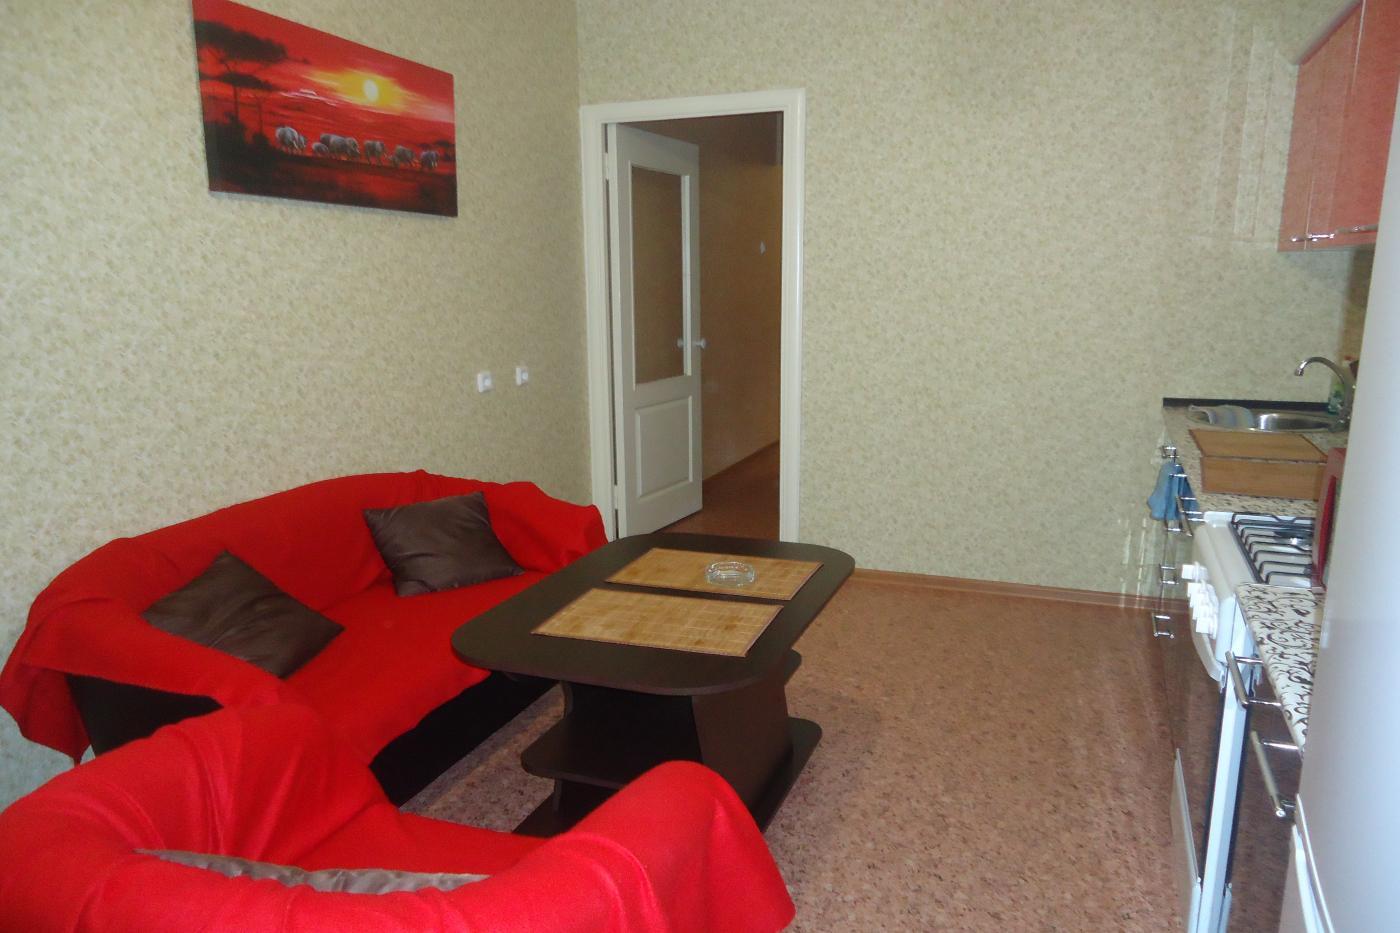 1-комнатная квартира посуточно (вариант № 3270), ул. 9 Января улица, фото № 8